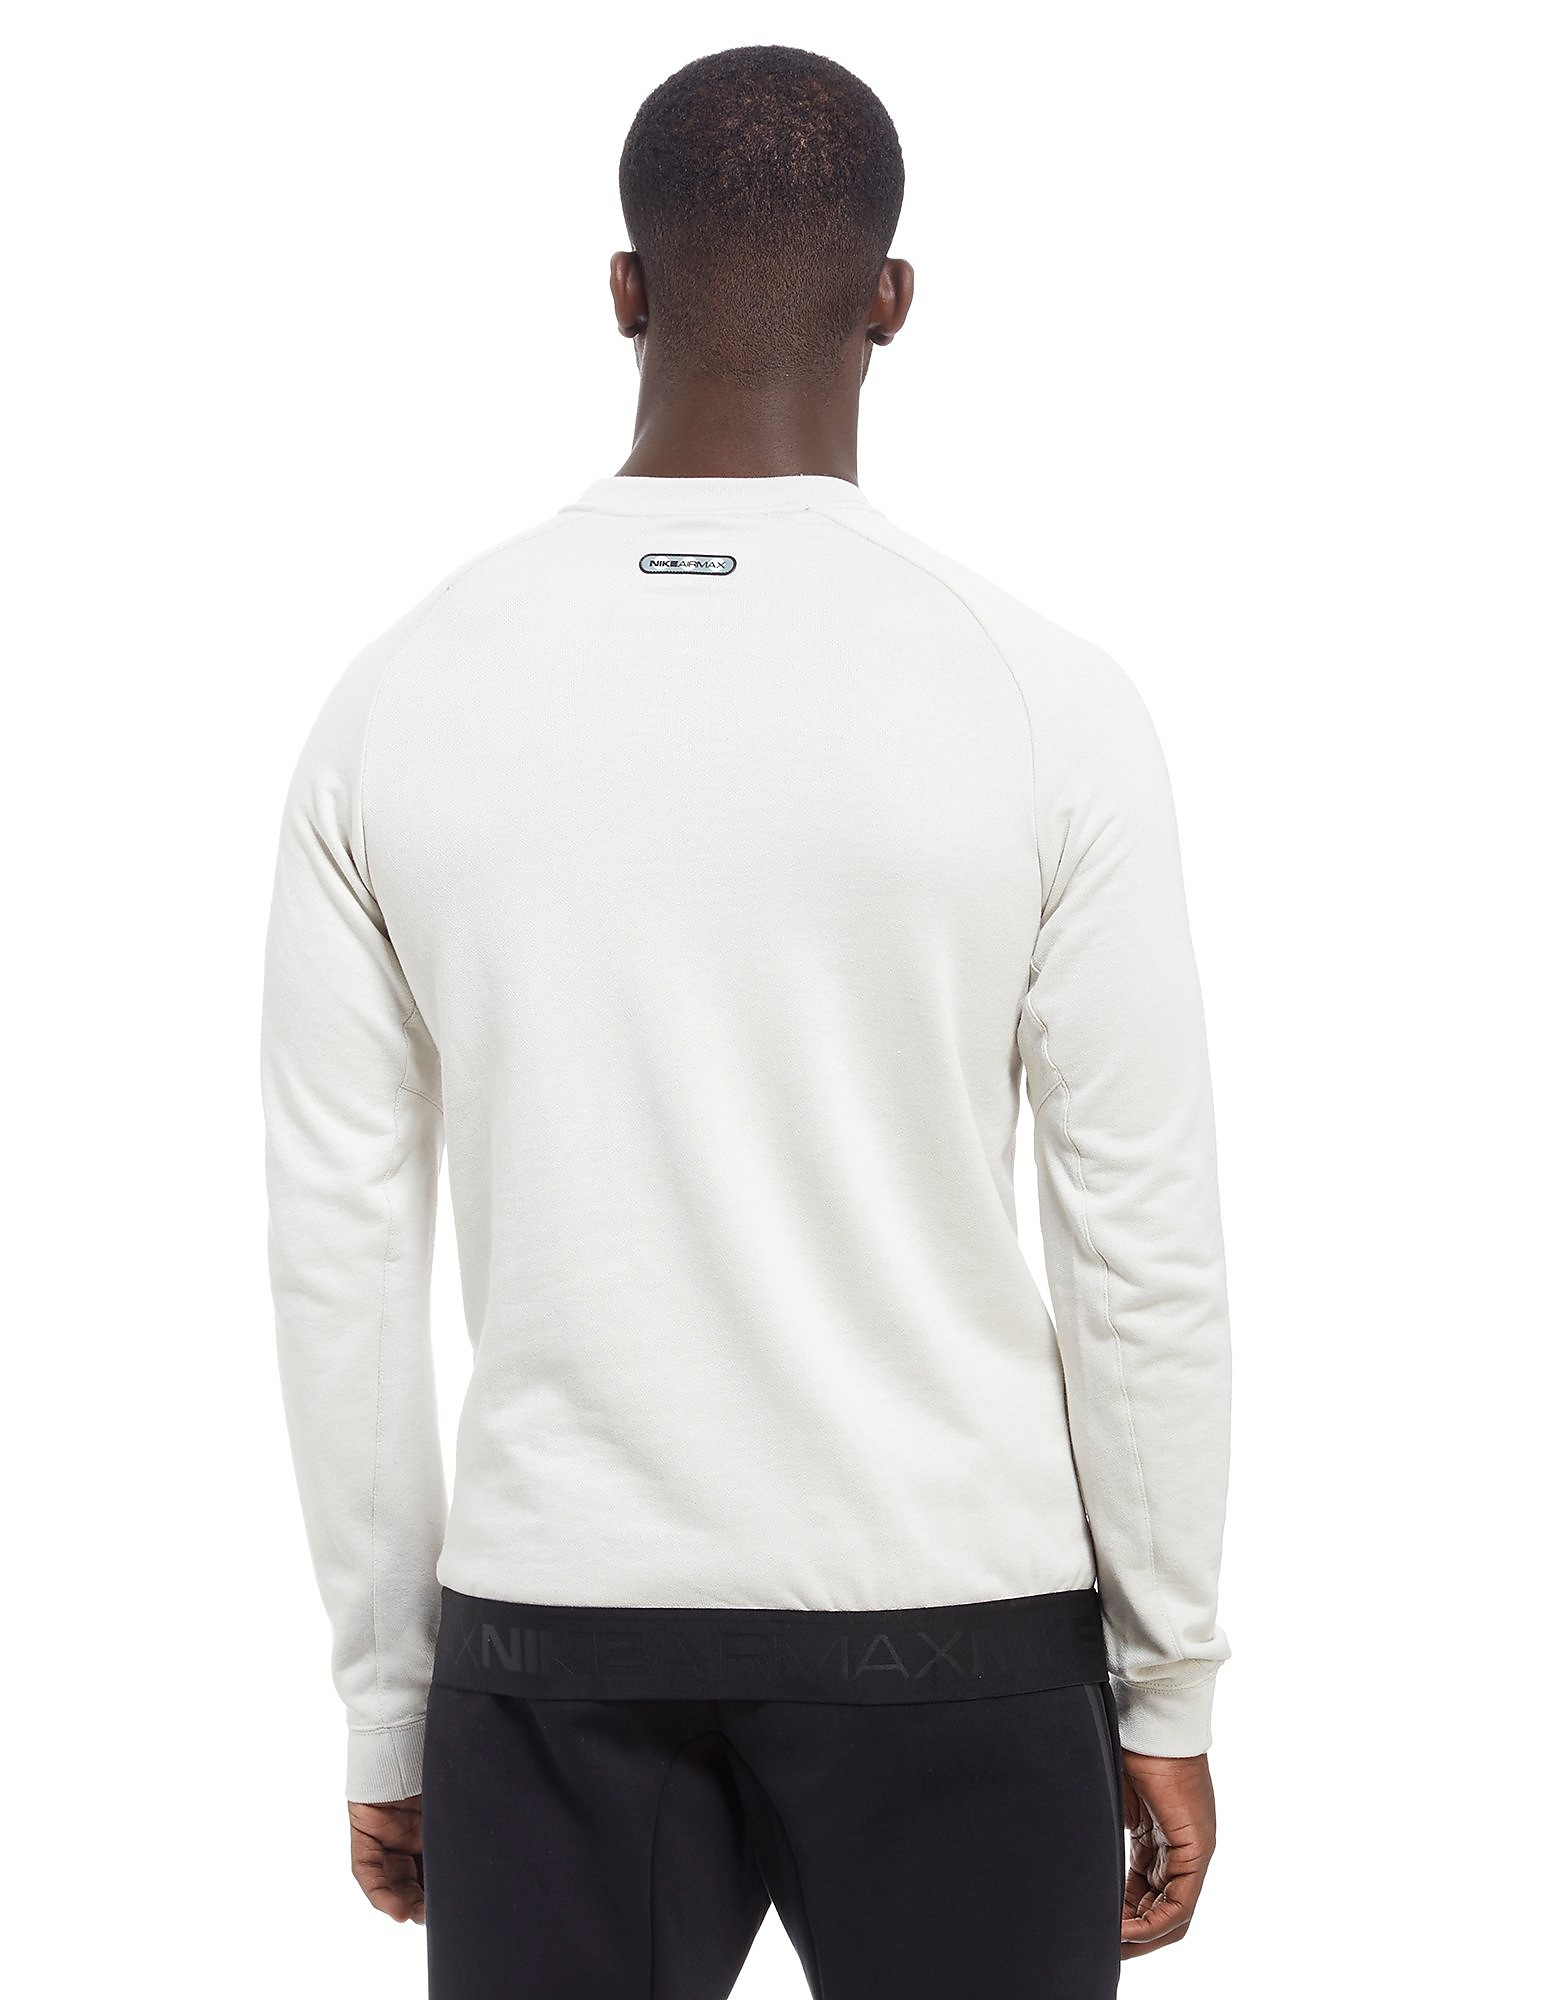 Nike Air Max Sweatshirt